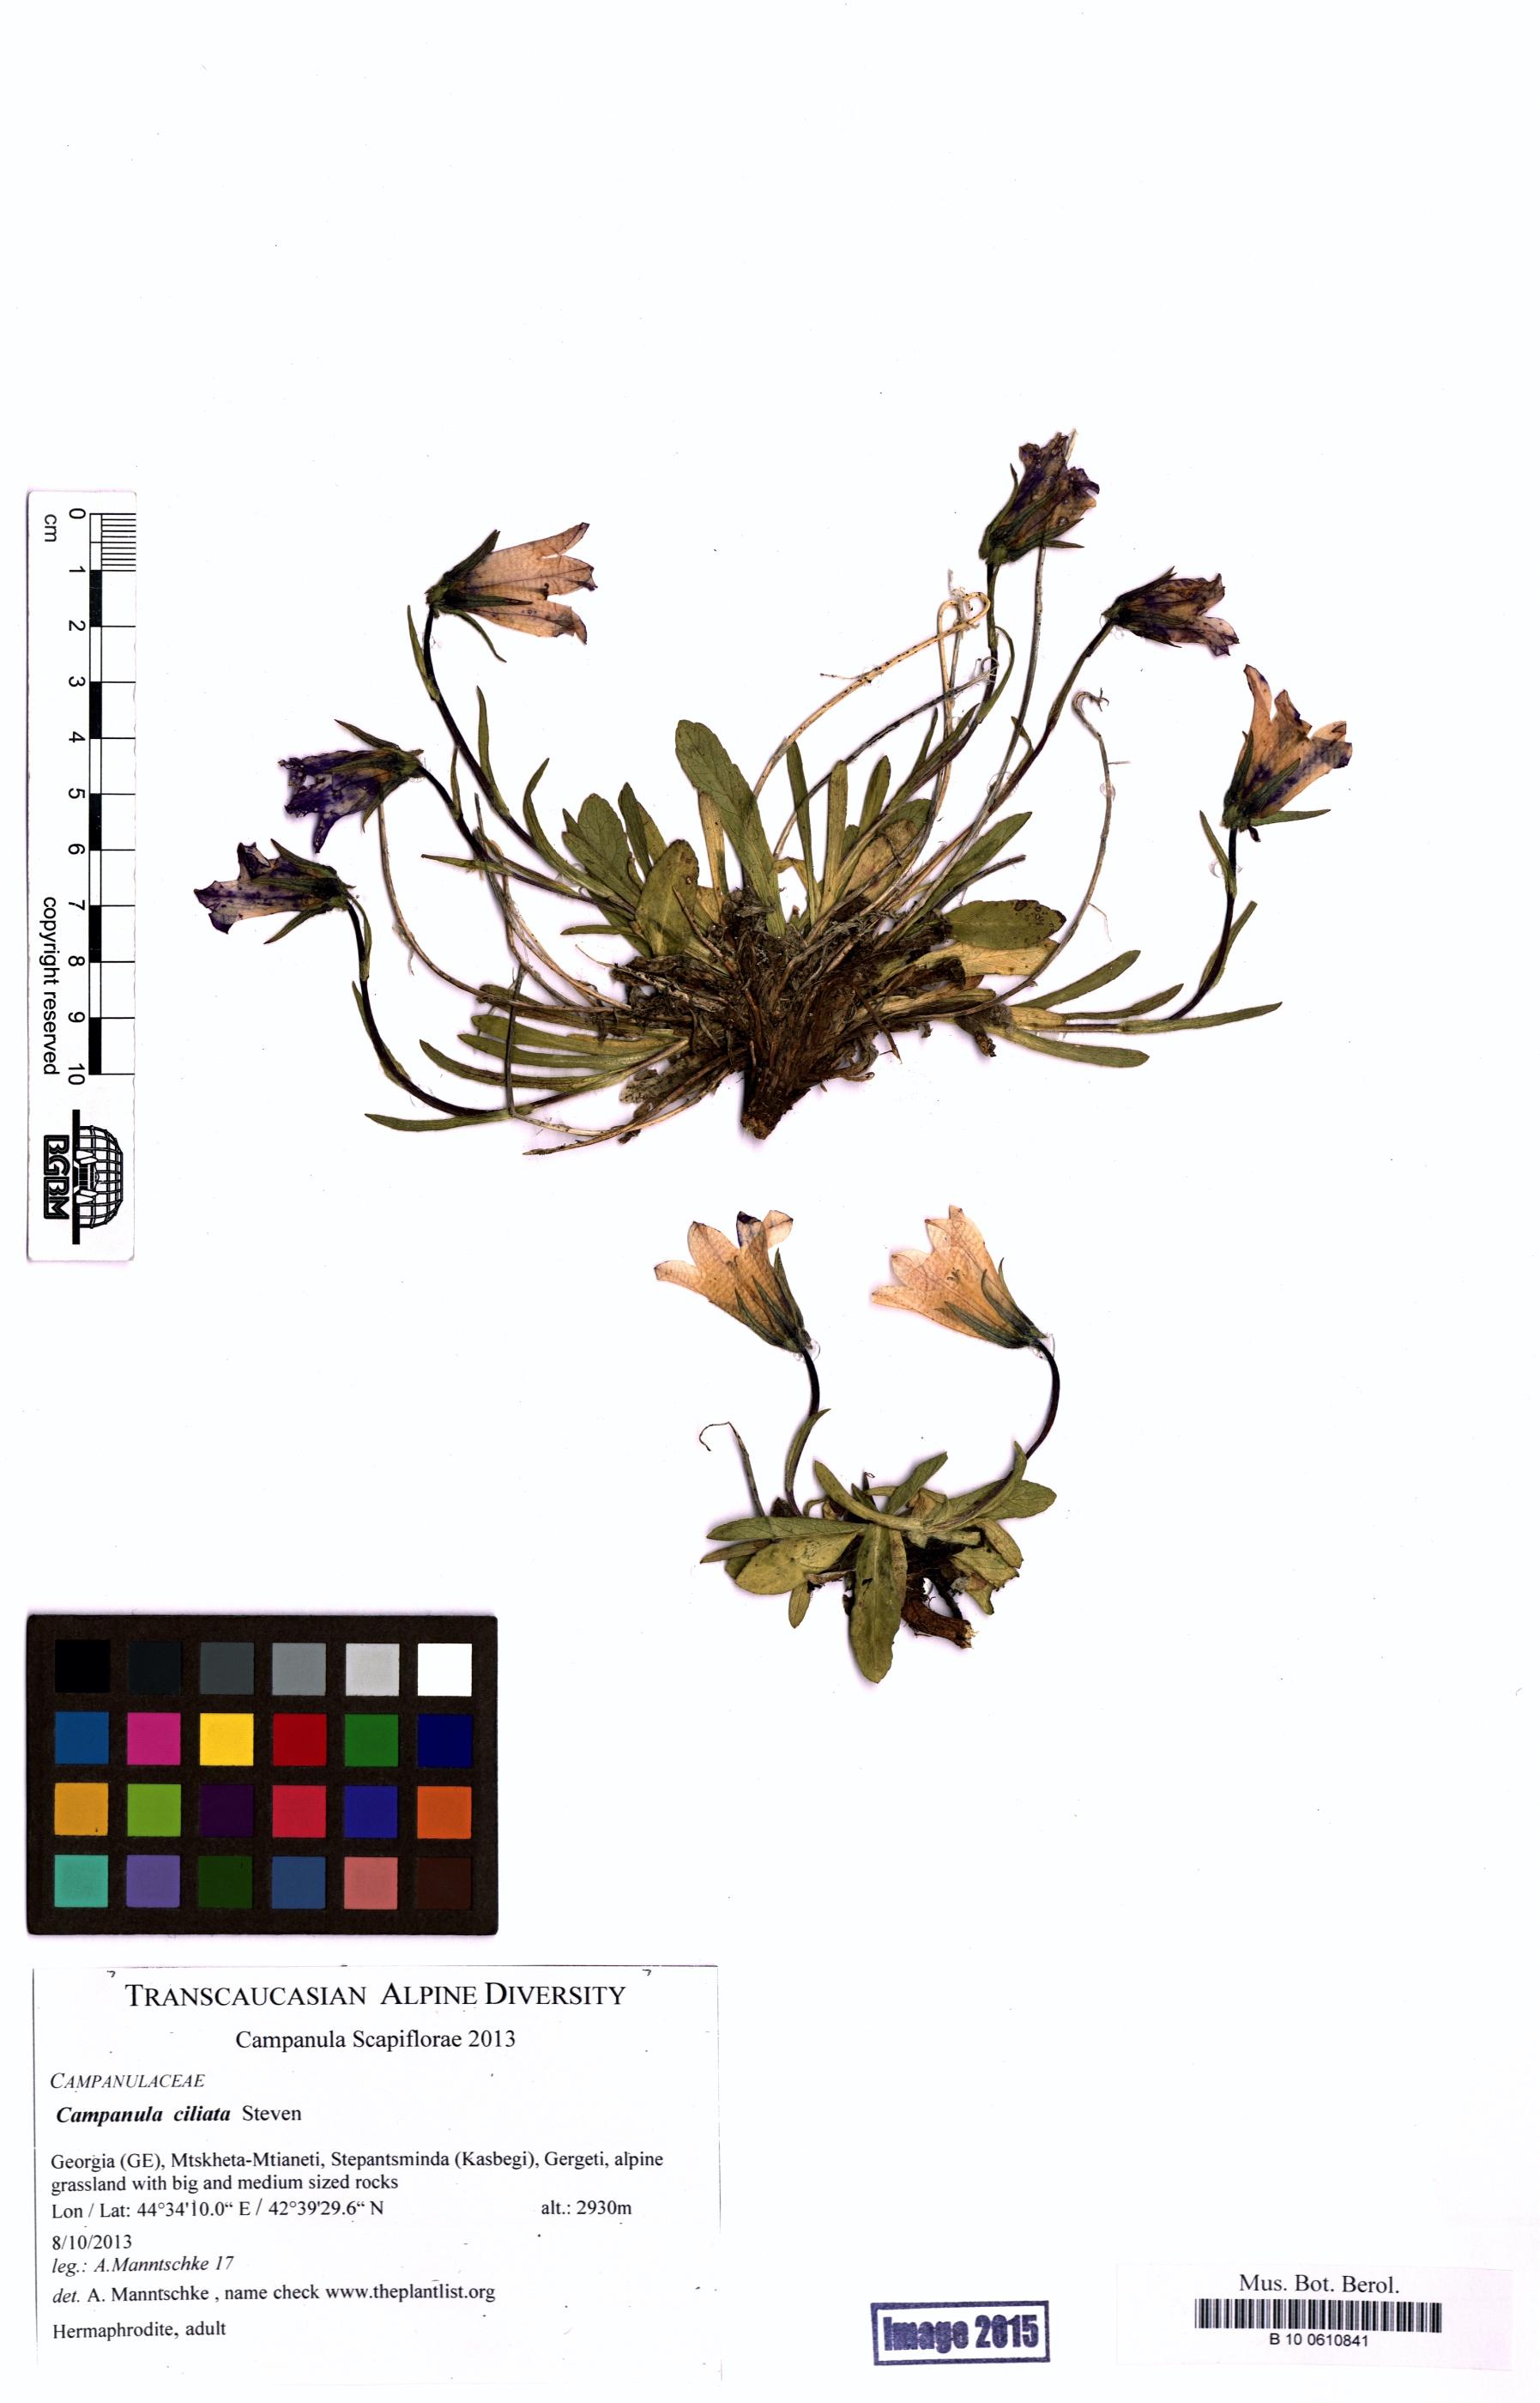 http://ww2.bgbm.org/herbarium/images/B/10/06/10/84/B_10_0610841.jpg